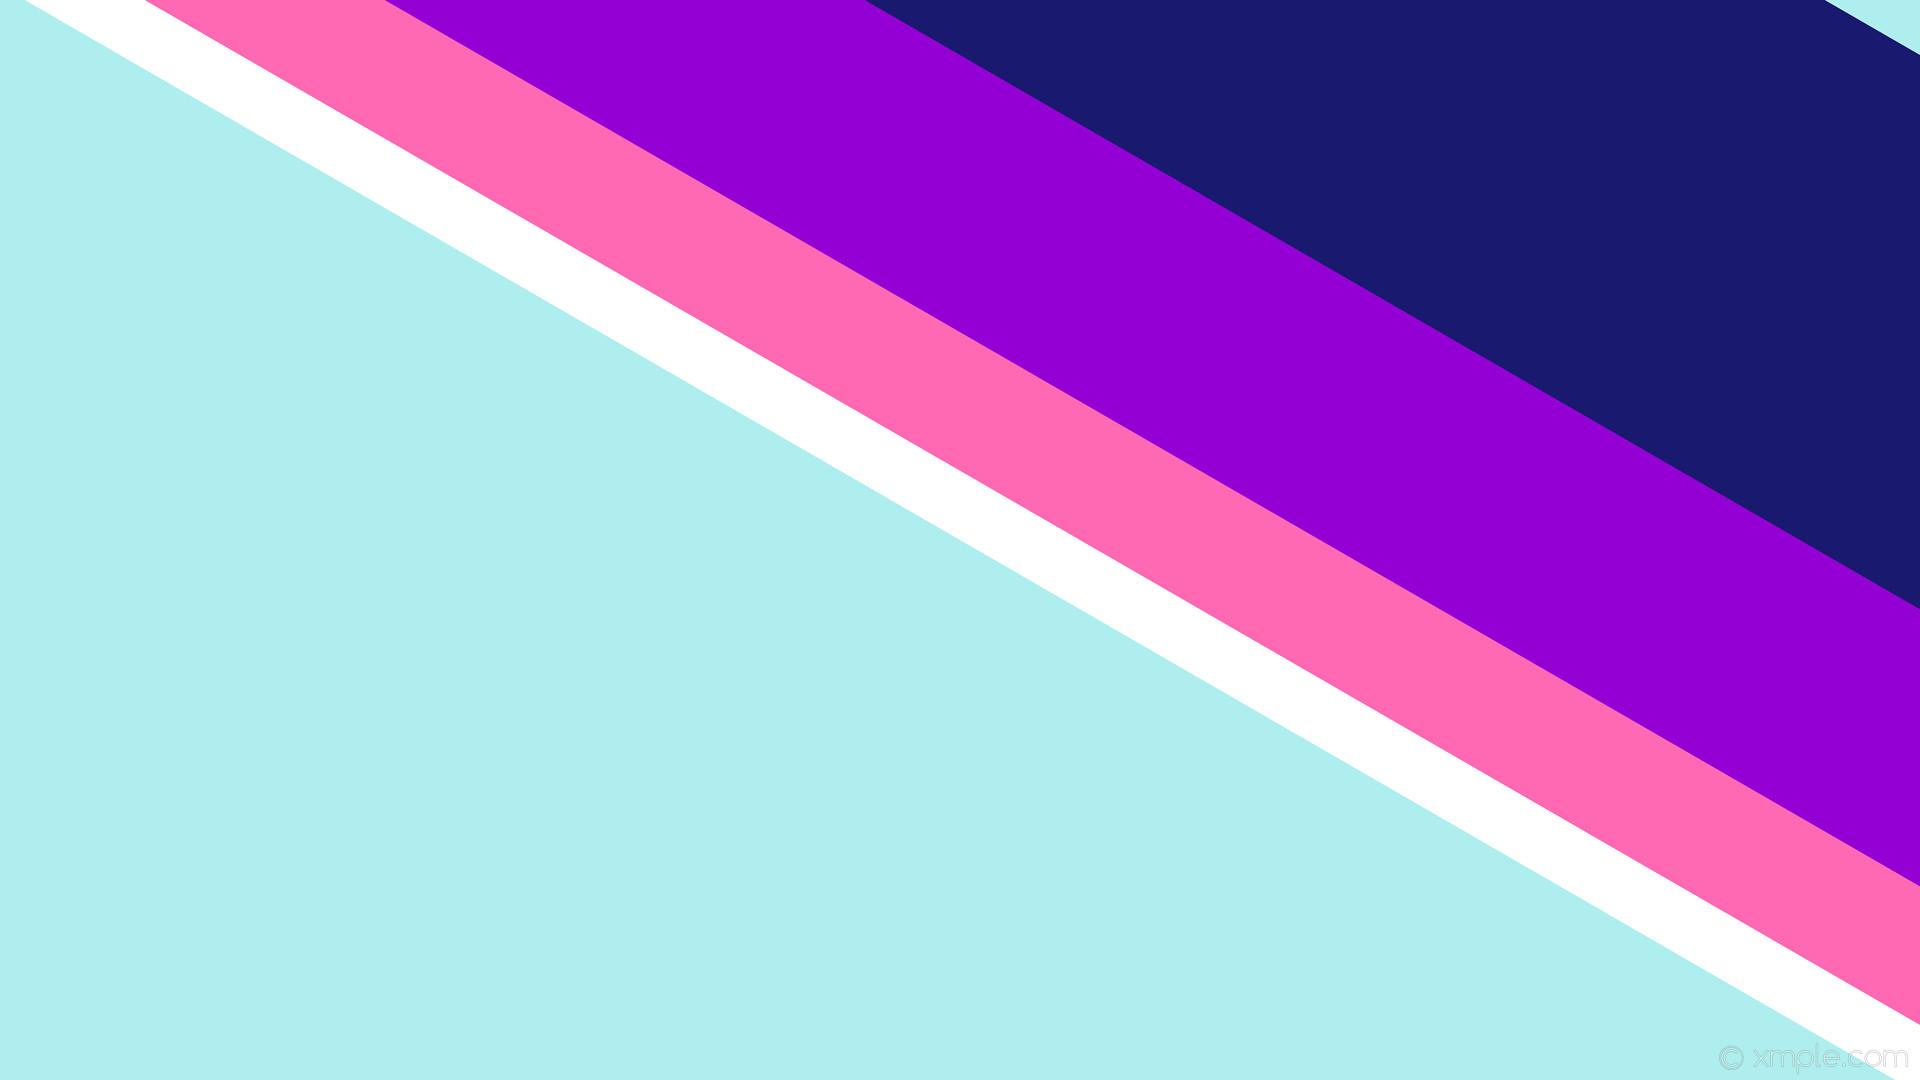 wallpaper streaks stripes pink white blue purple lines hot pink dark violet  midnight blue pale turquoise